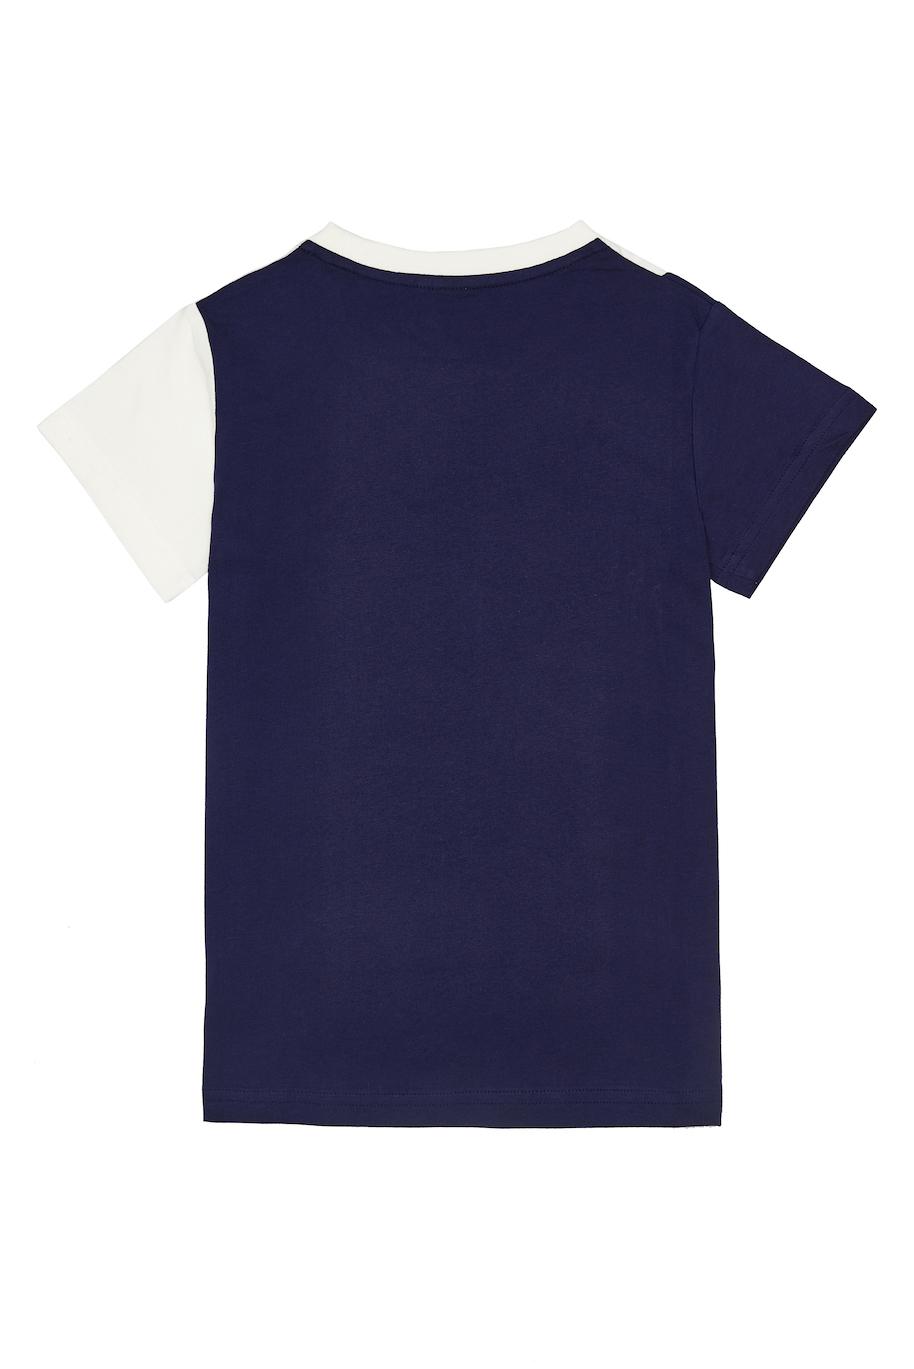 Dívčí tričko Own Magic - růžová Navy/Bílá, Růžová/Tyrkysová